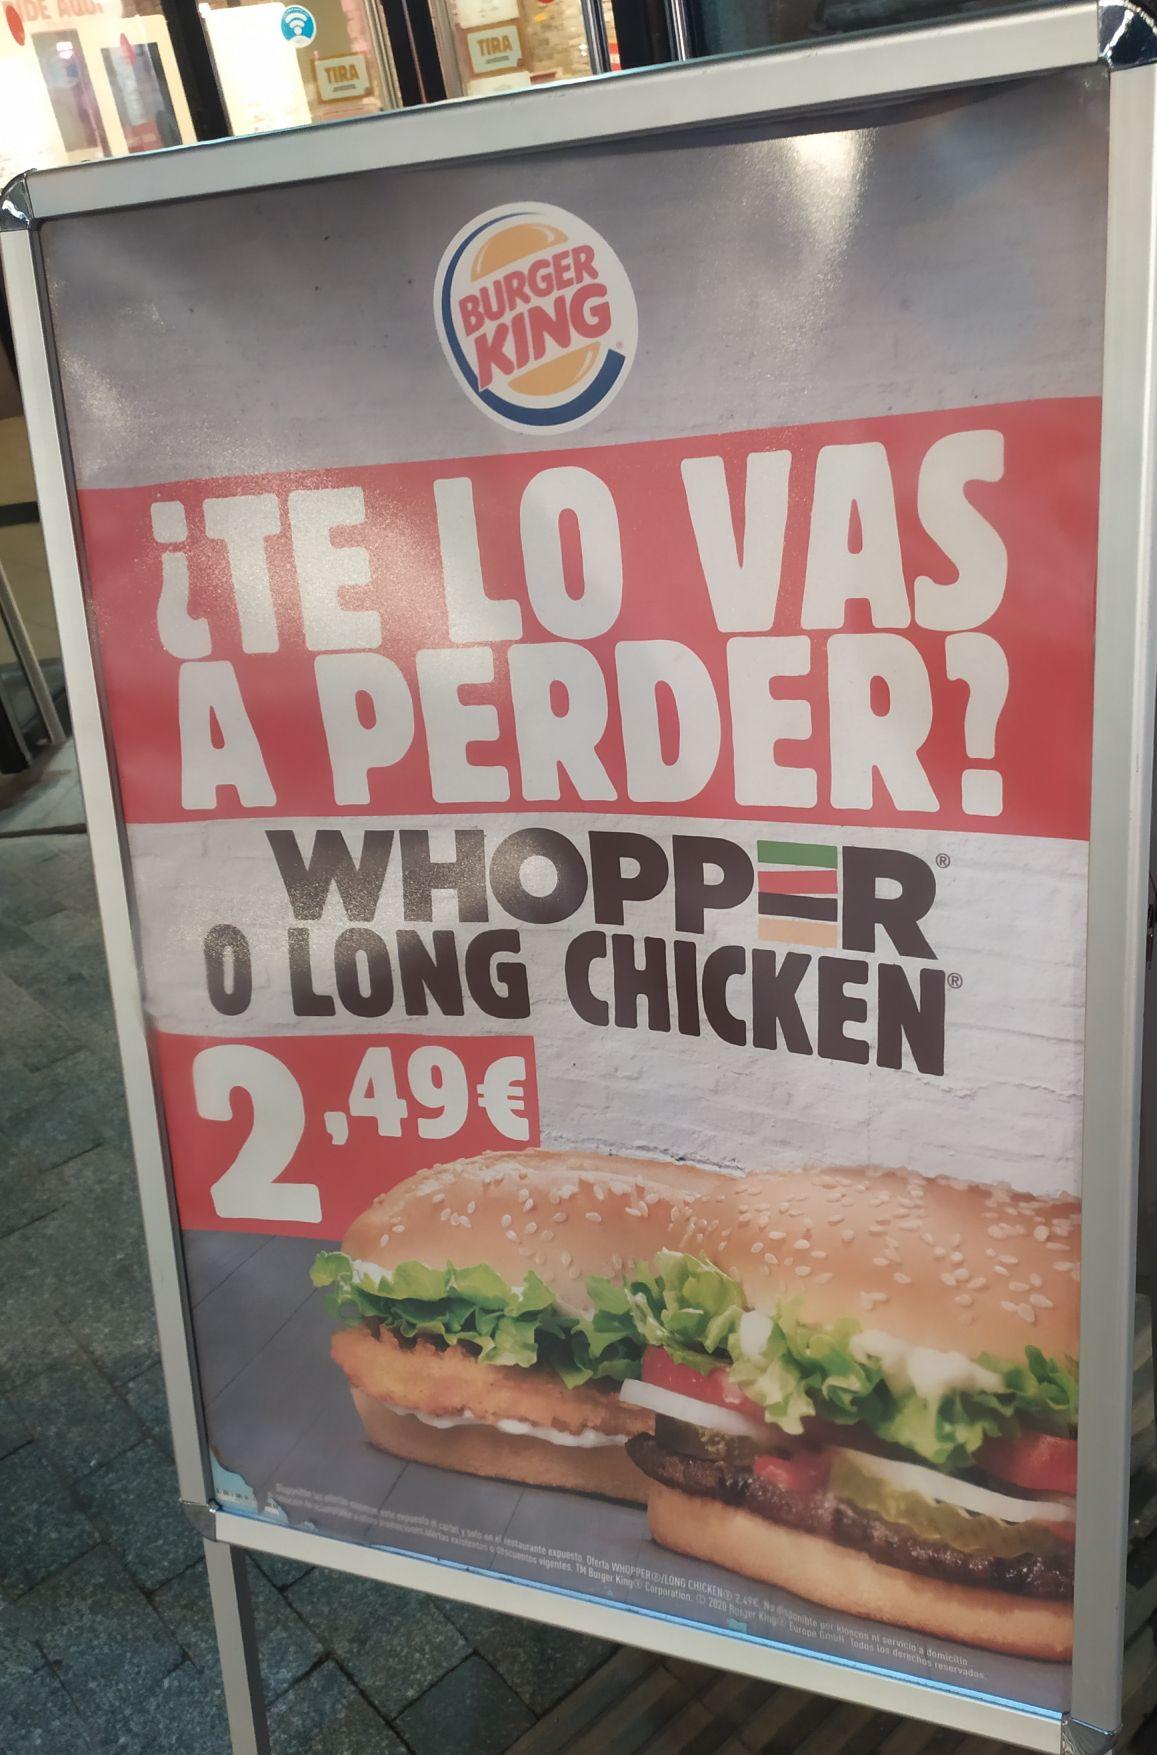 Whopper o Long Chicken 2.49